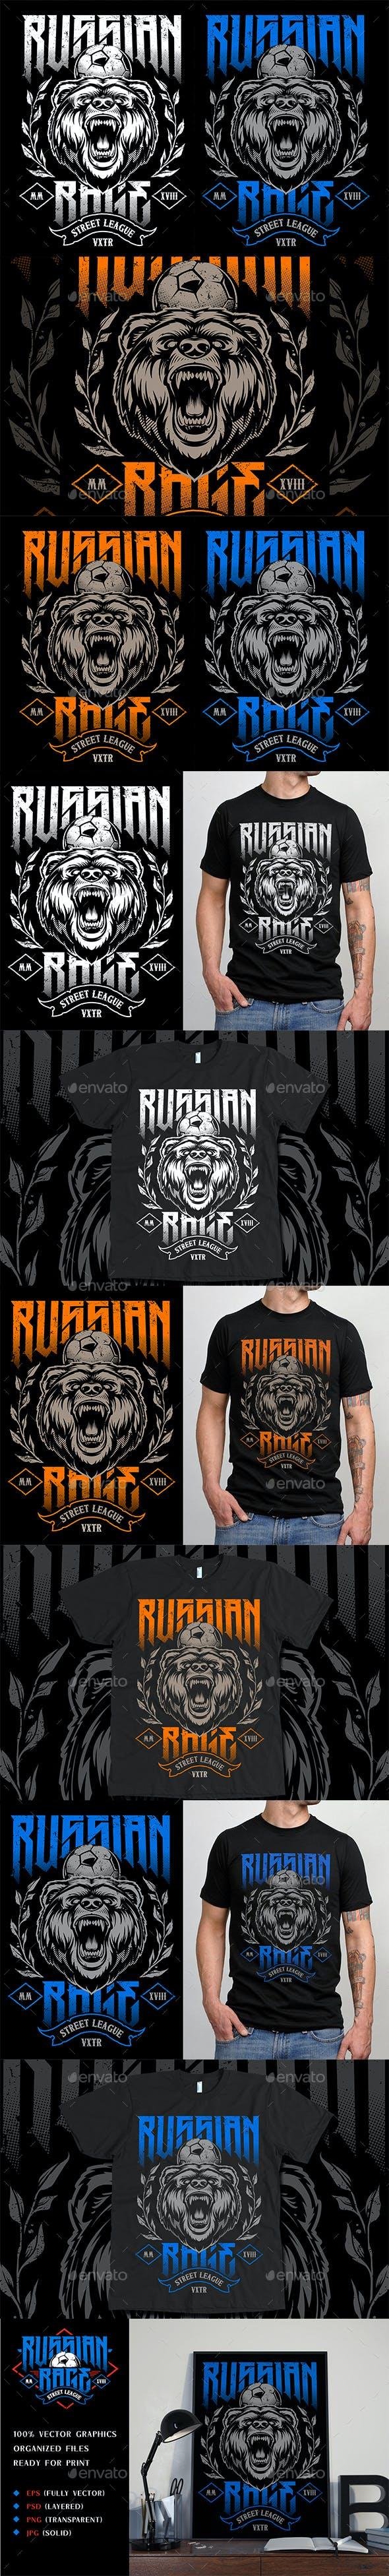 Russian Rage Vector Print